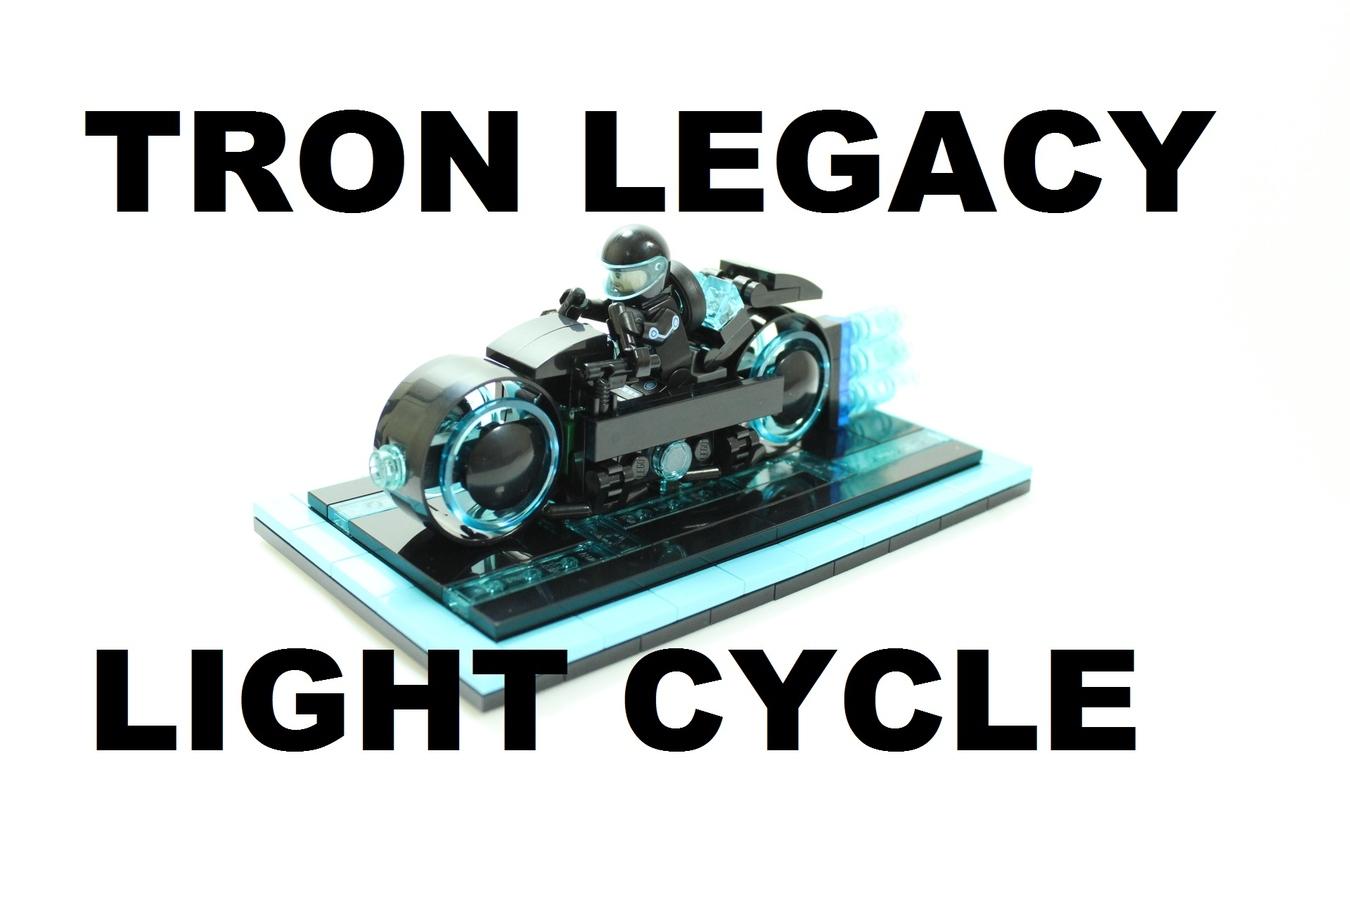 lego ideas - product ideas - tron legacy light cycle